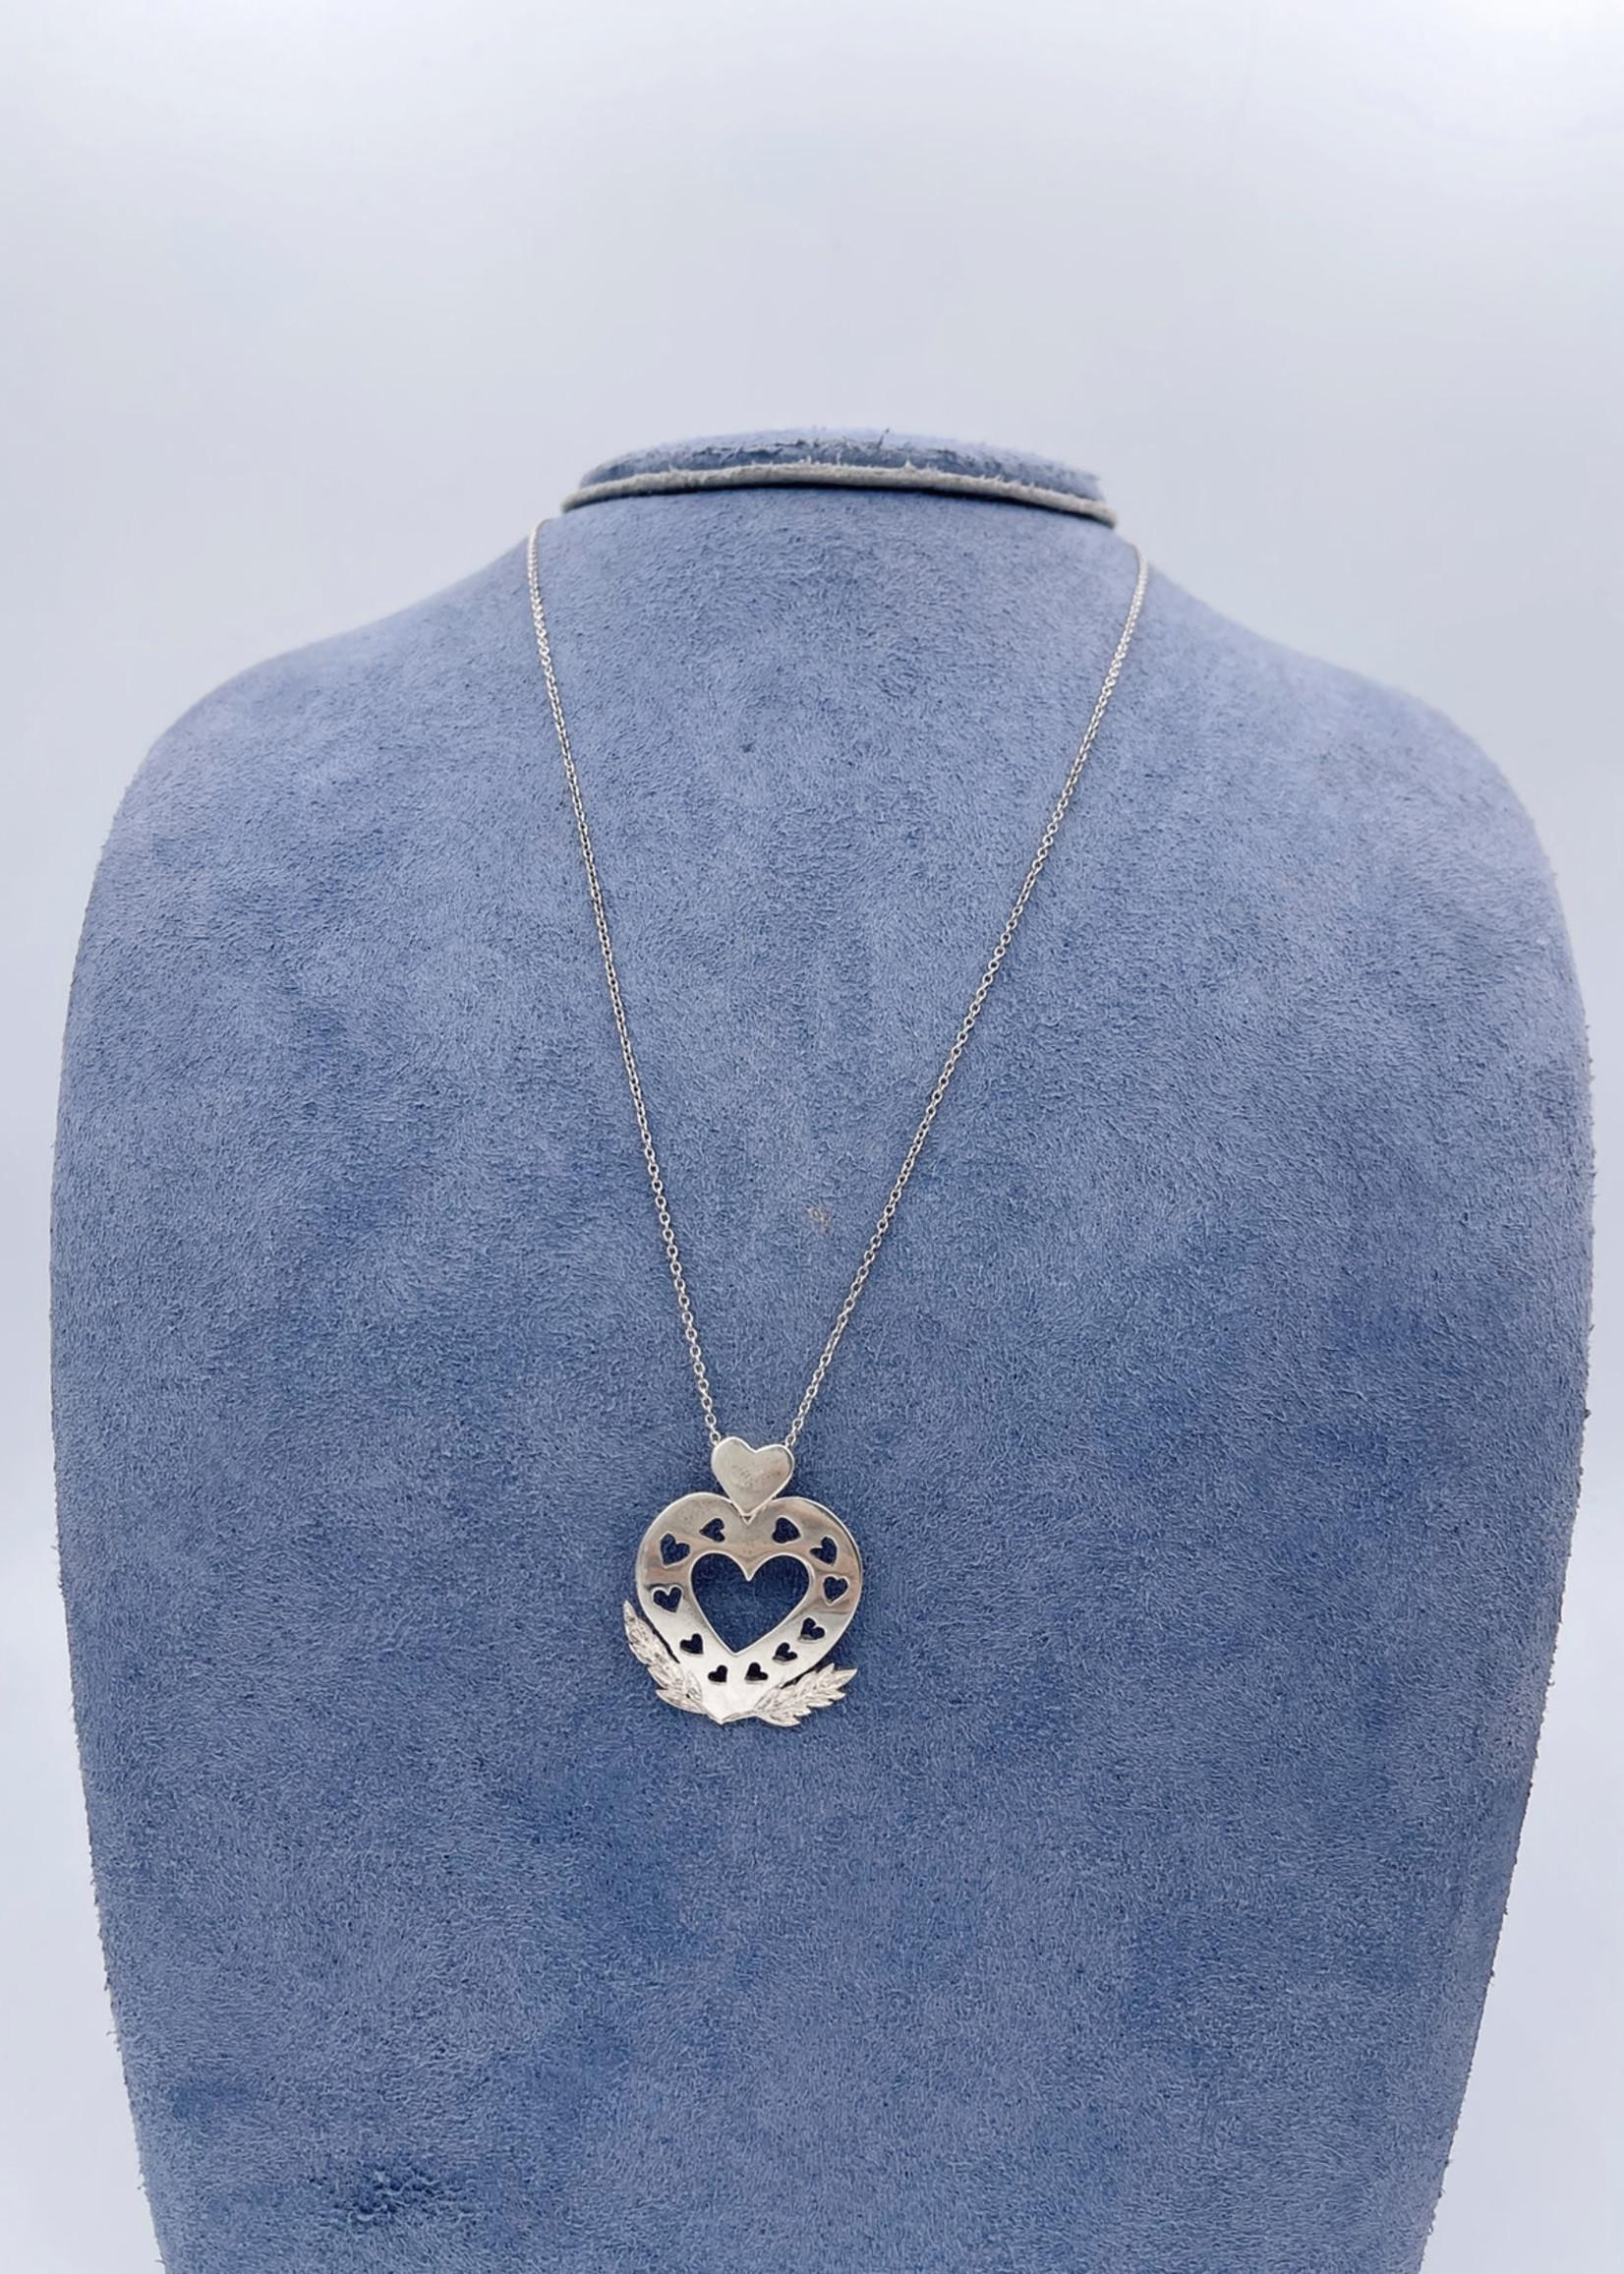 CJ Designs Heart Pendant Sterling Silver